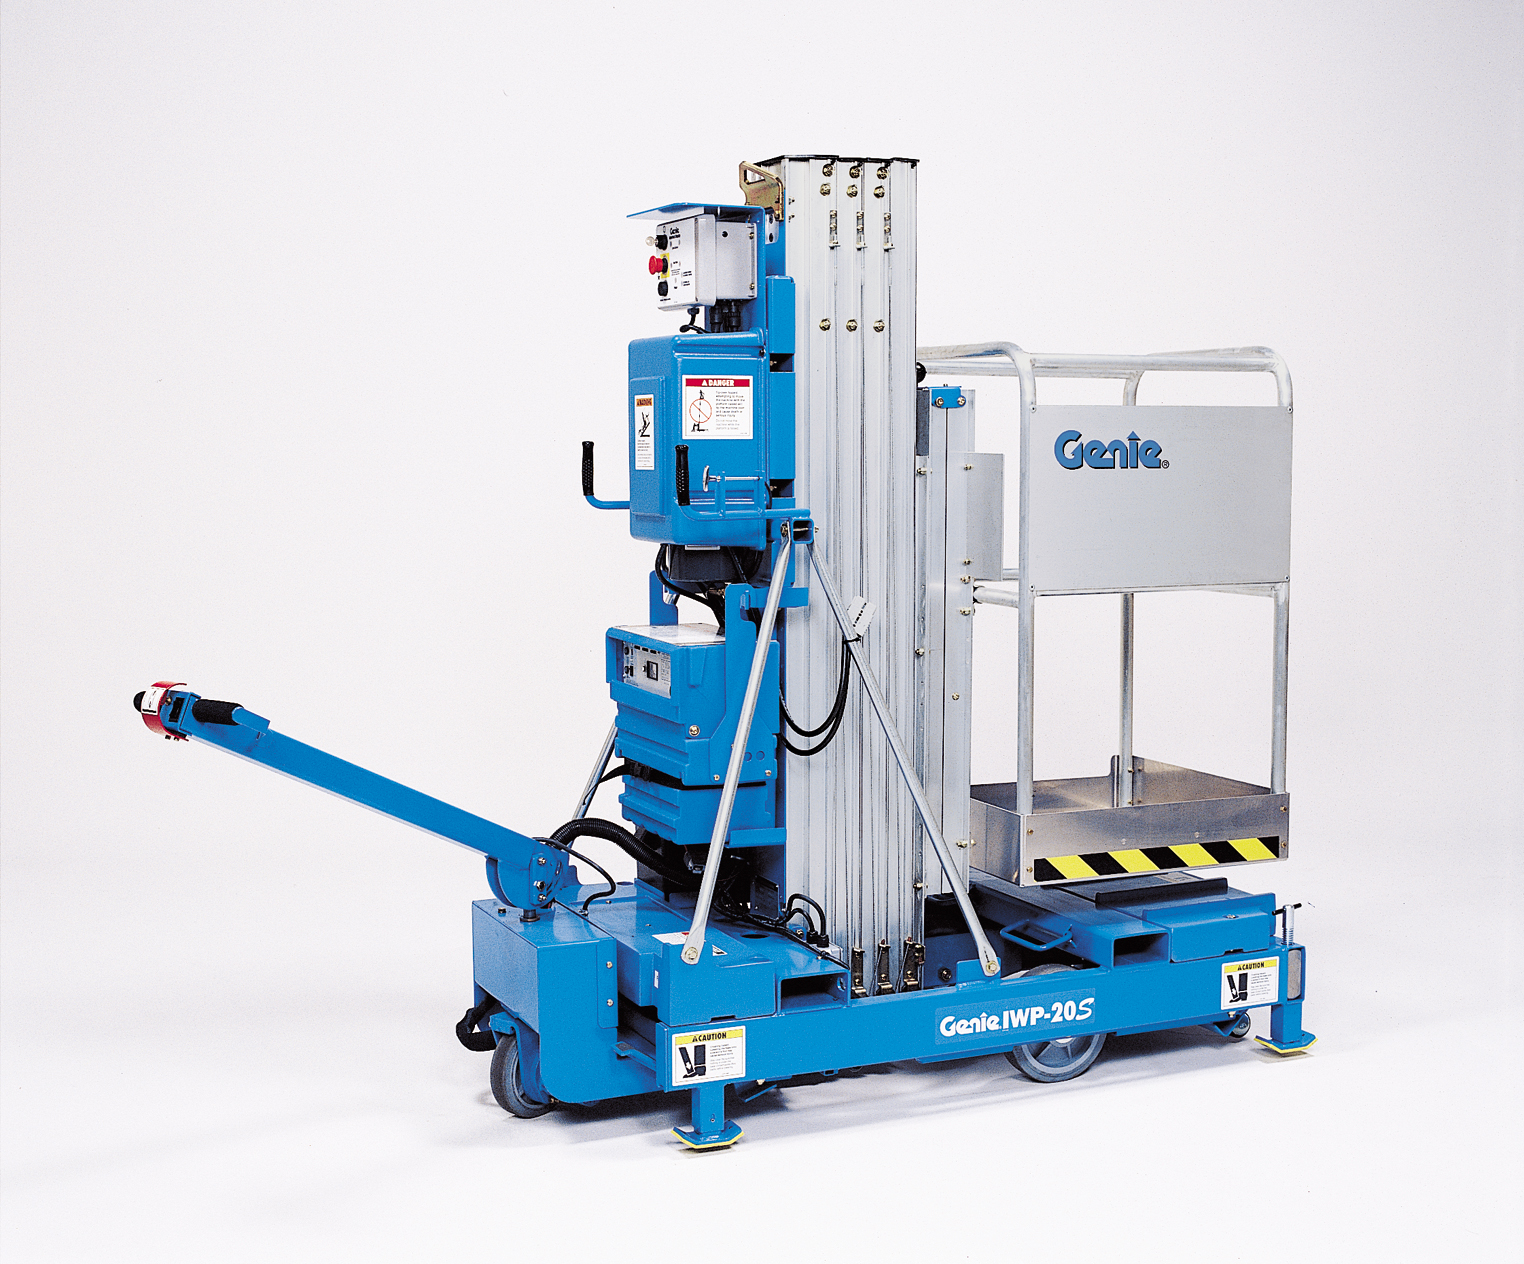 Vertical Lift Parts : Genie iwp s vertical lift cherry picker